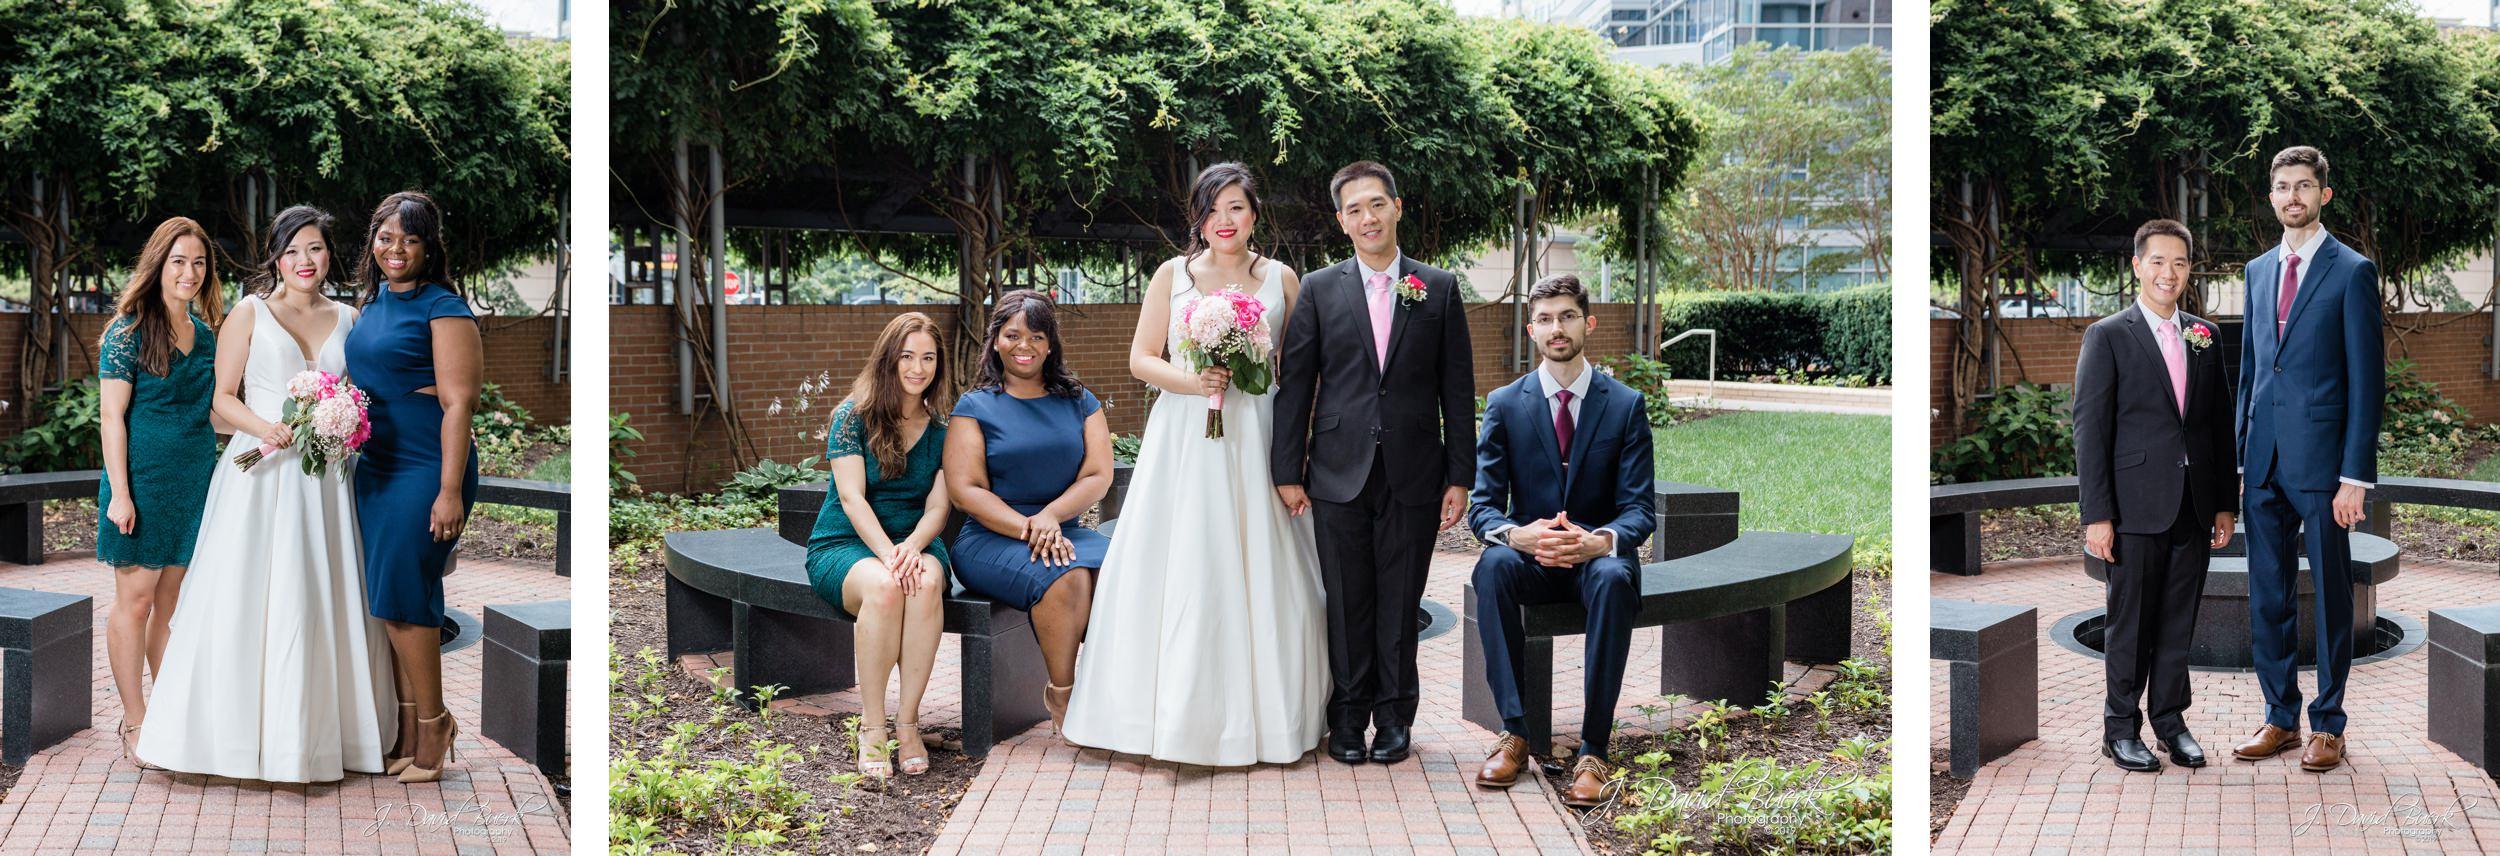 20190706 - David and Tiffany - Married 6.jpg